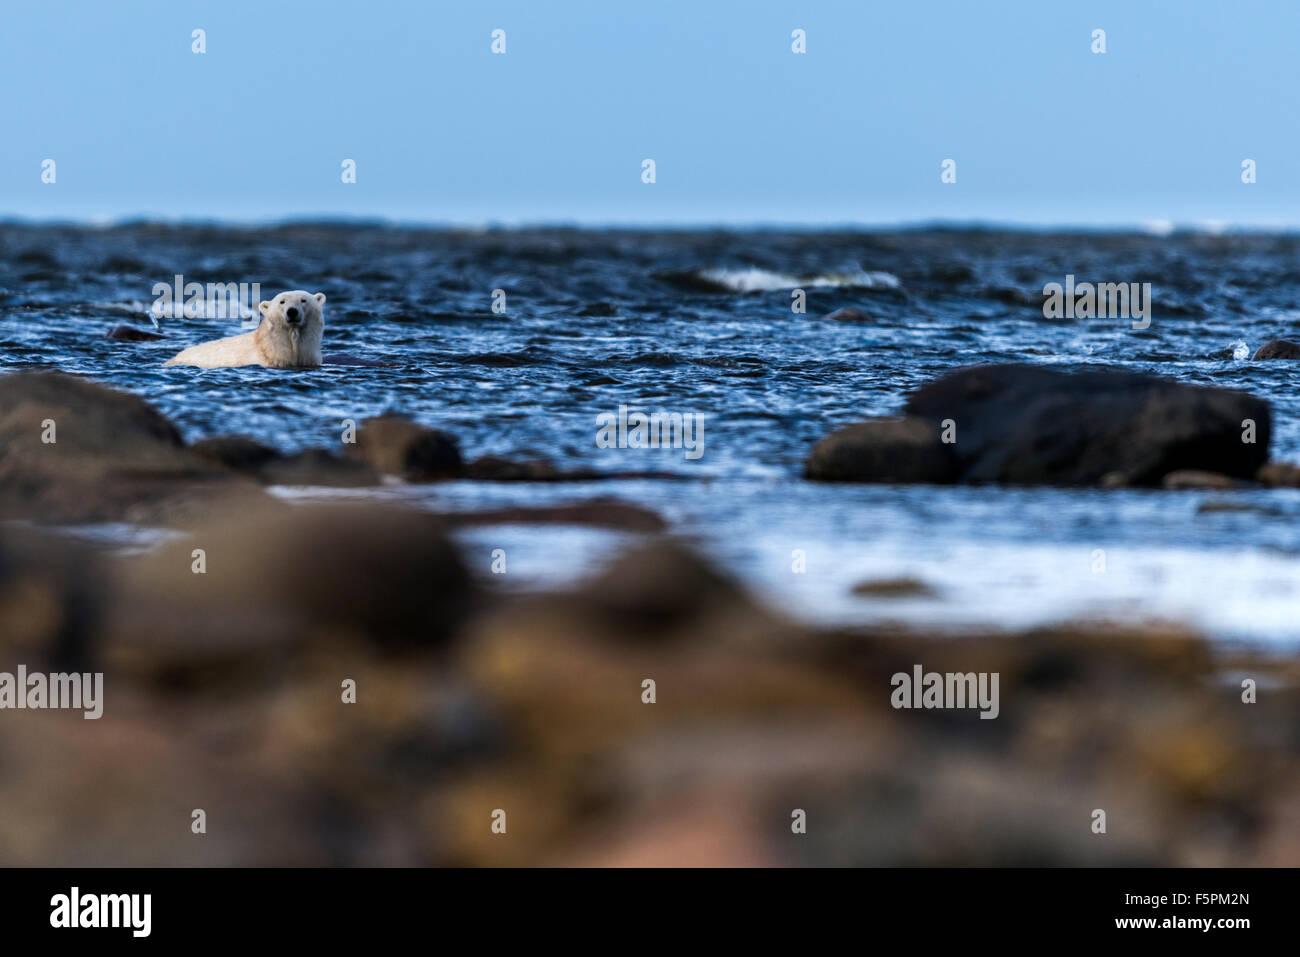 Polar Bear adult (Ursus maritimus) relaxing in sea water Churchill, Manitoba, Canada - Stock Image